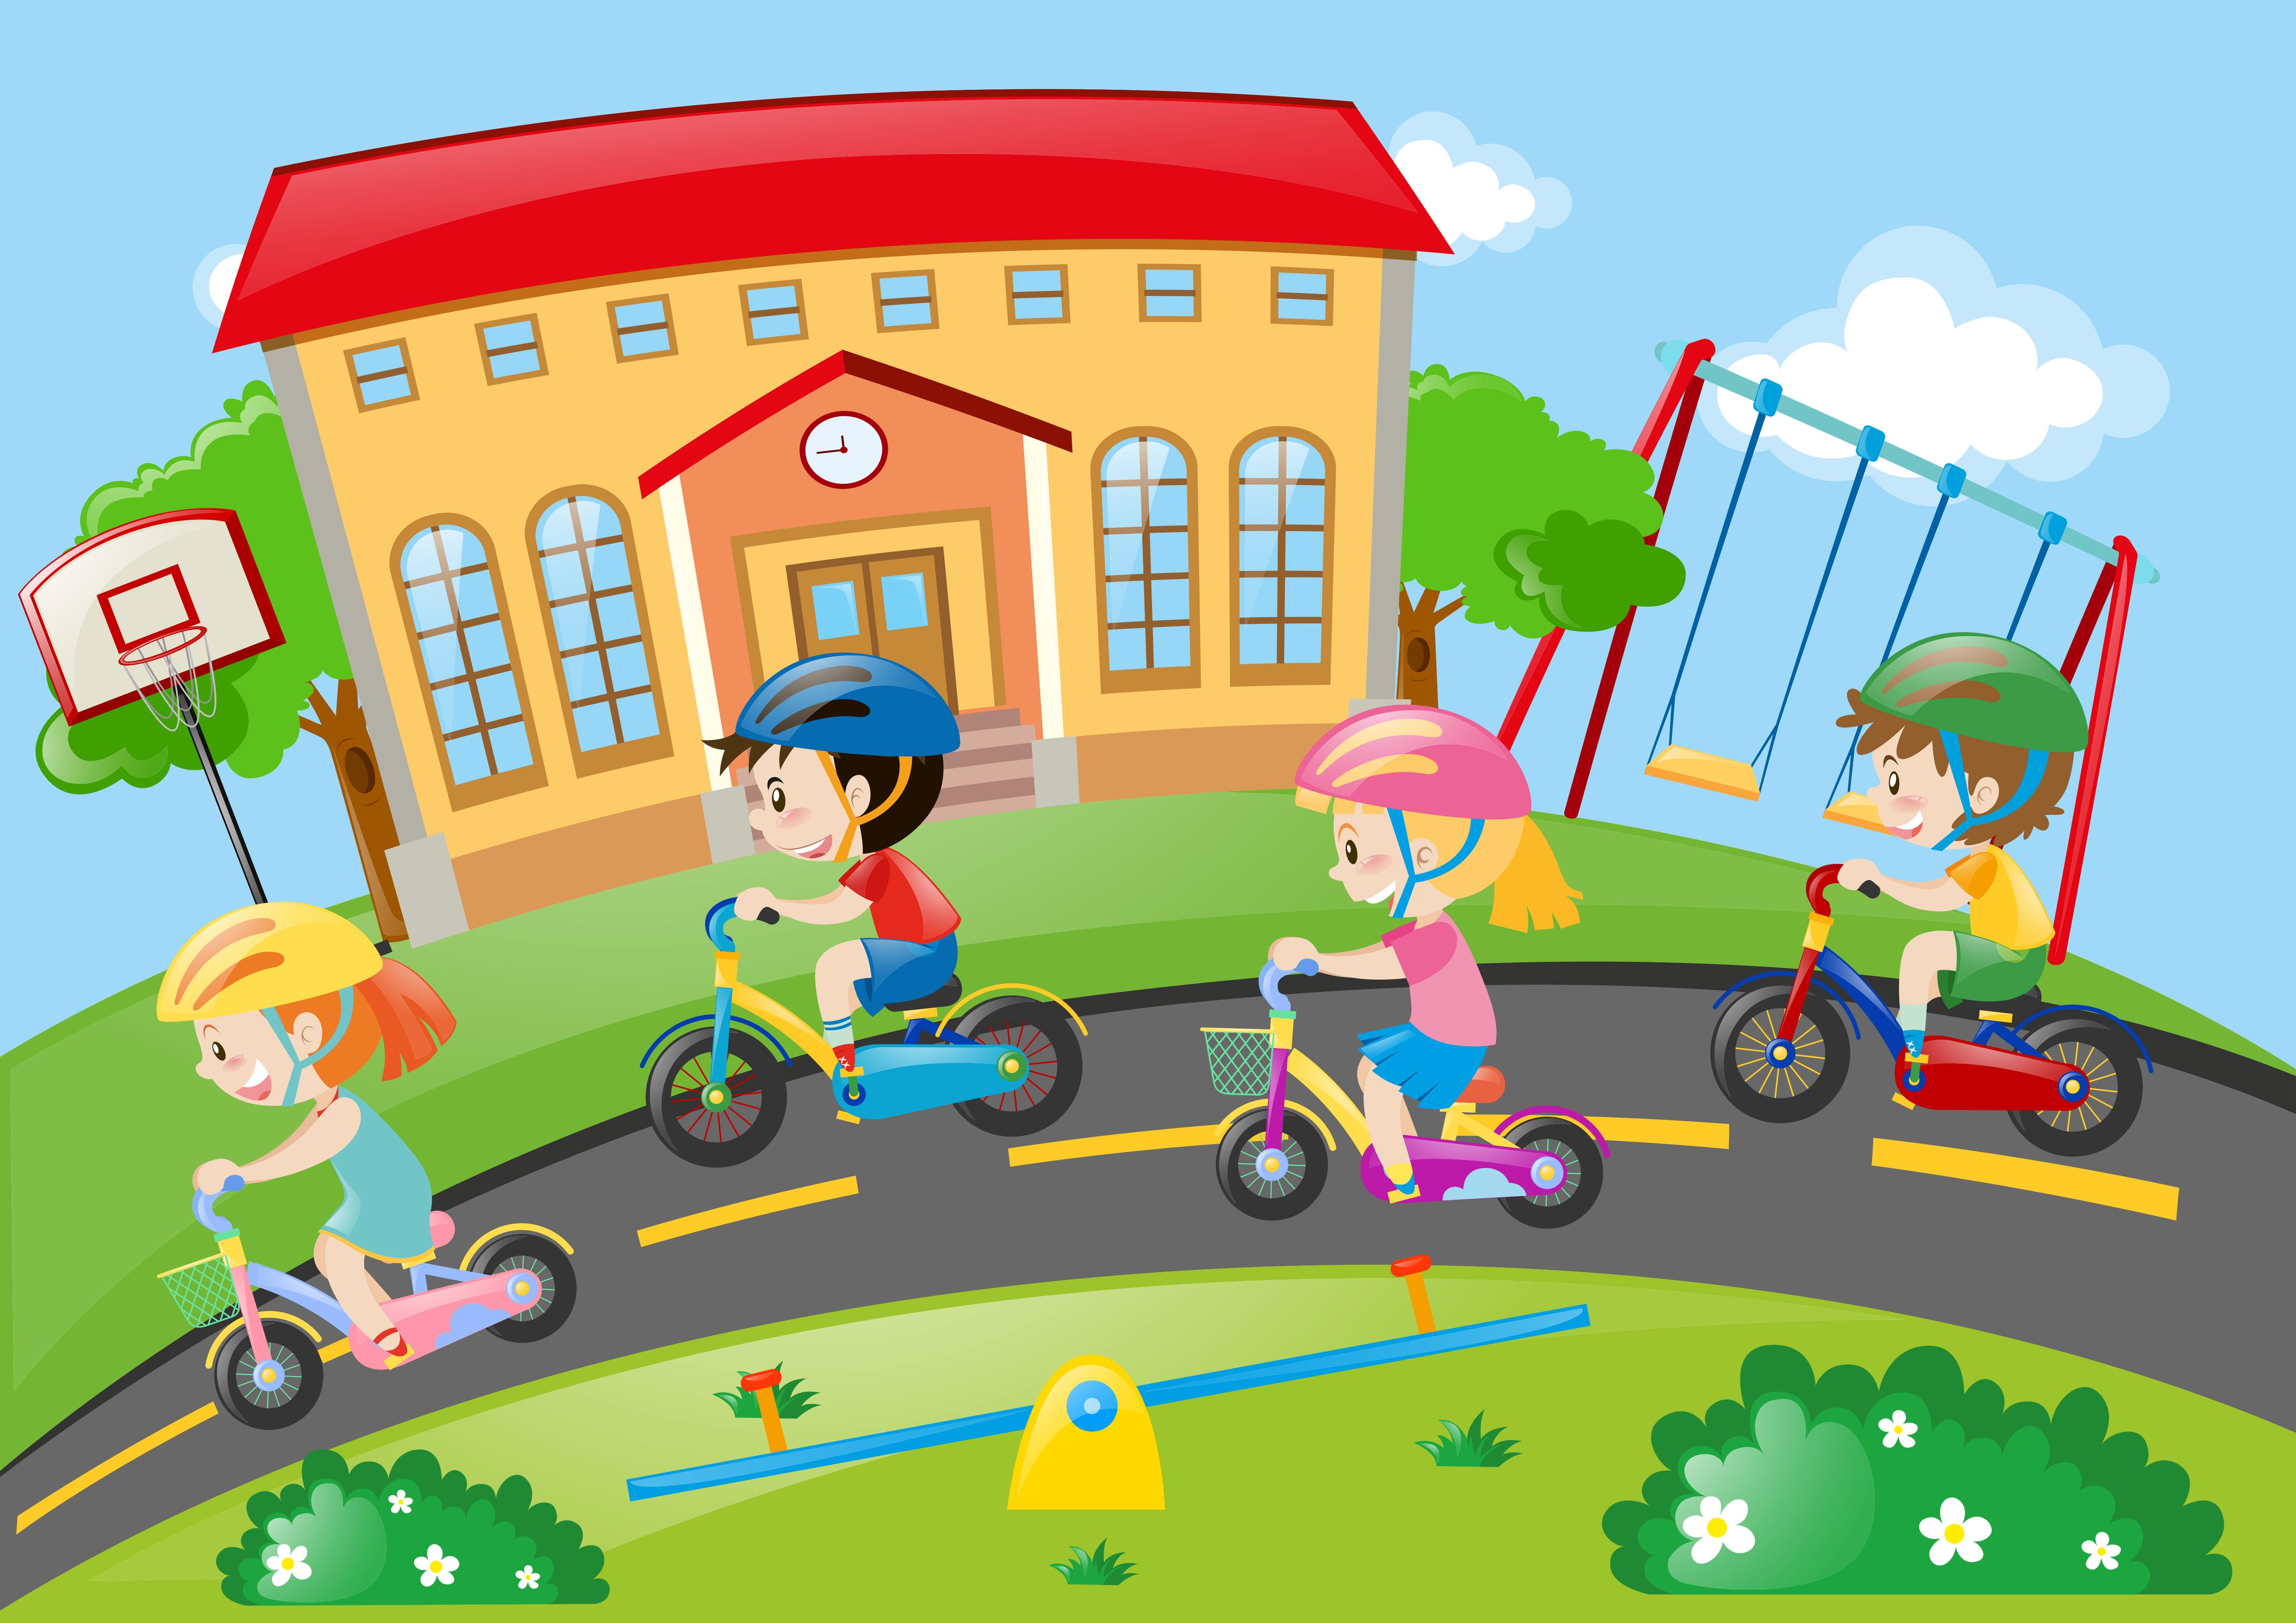 Criancas Andando De Bicicleta Na Estrada Download Vetores Gratis